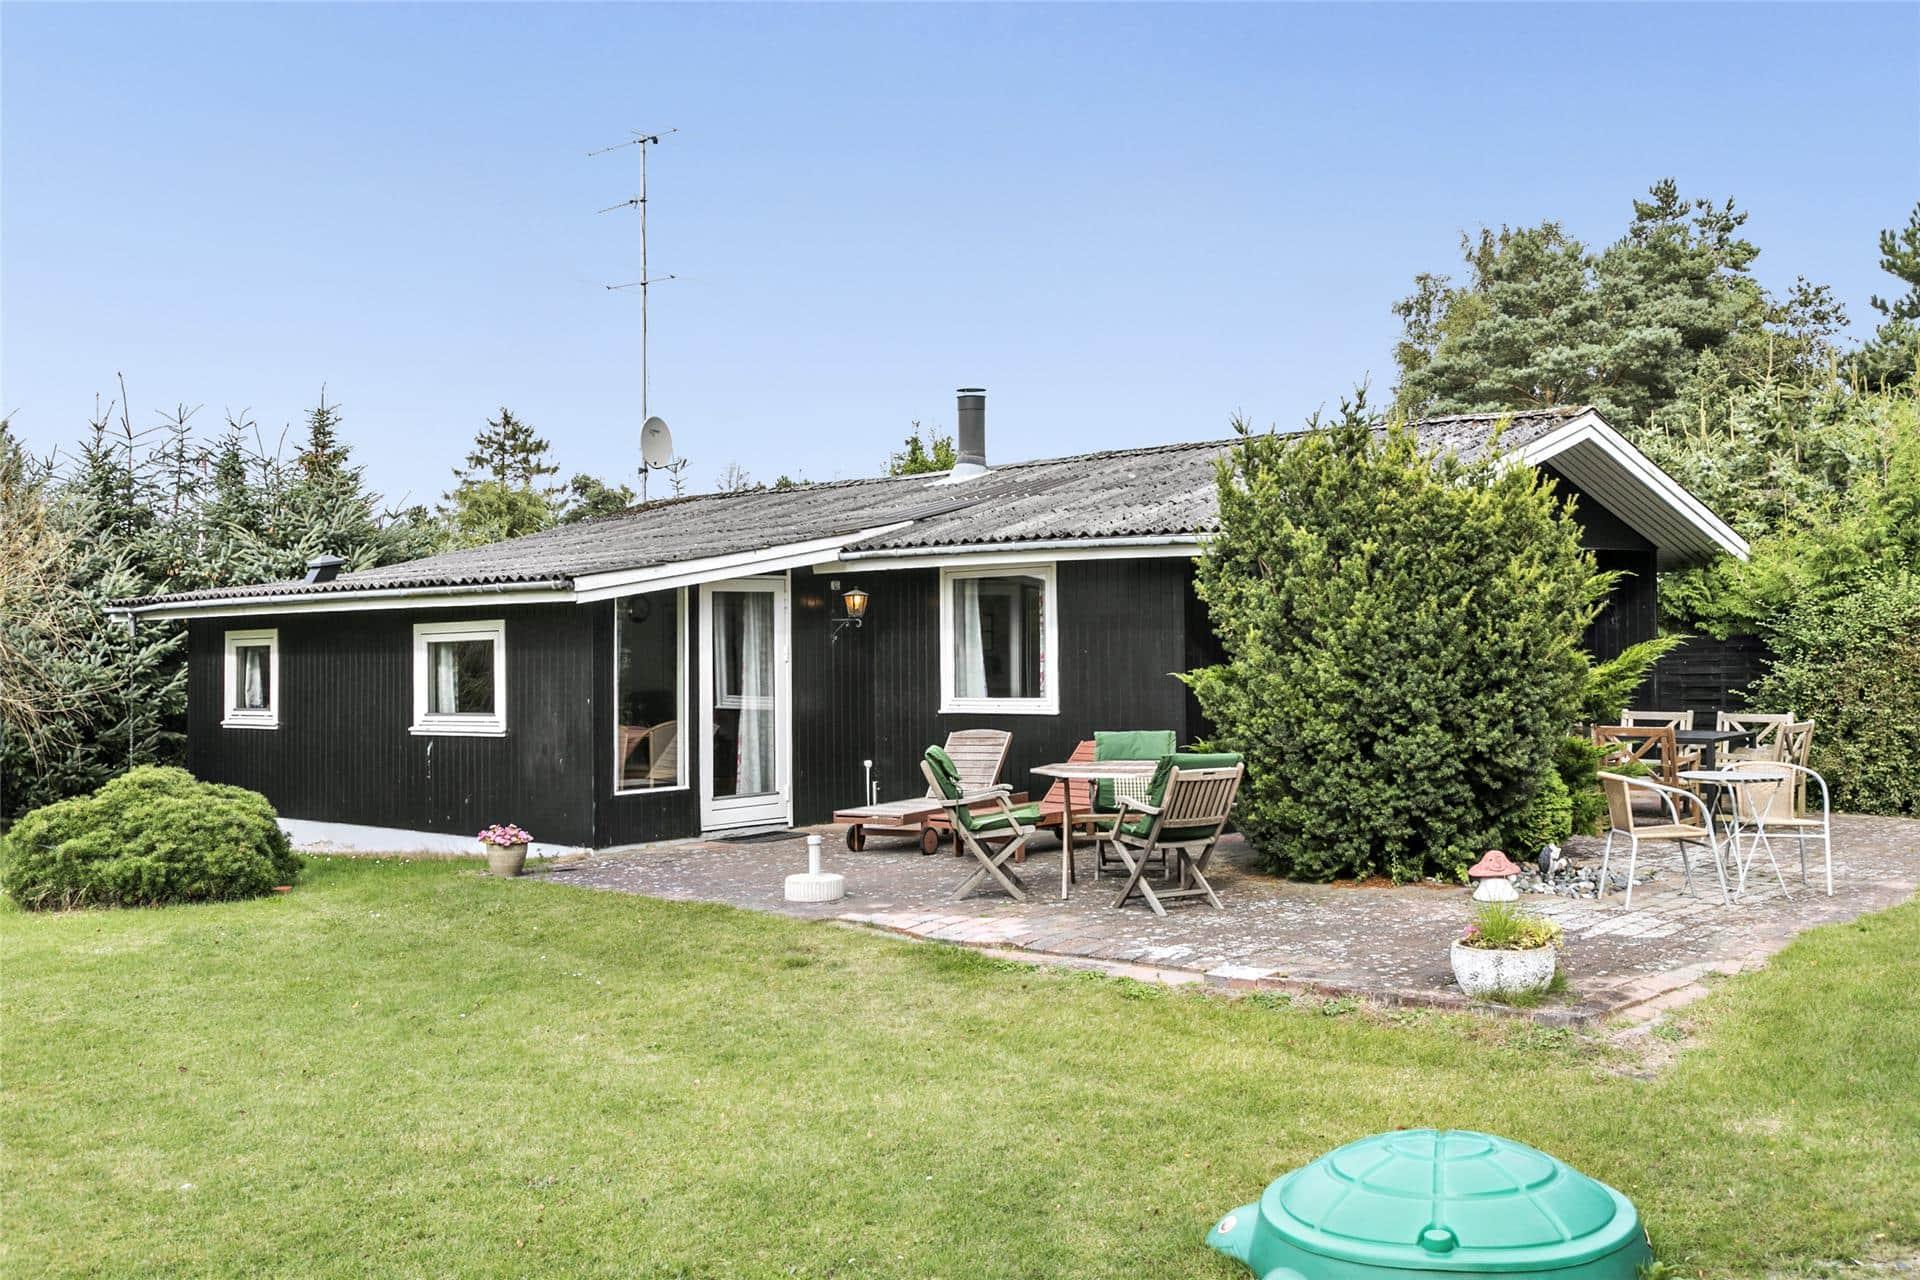 Billede 1-174 Sommerhus M15005, Perikumvej 4, DK - 4873 Væggerløse